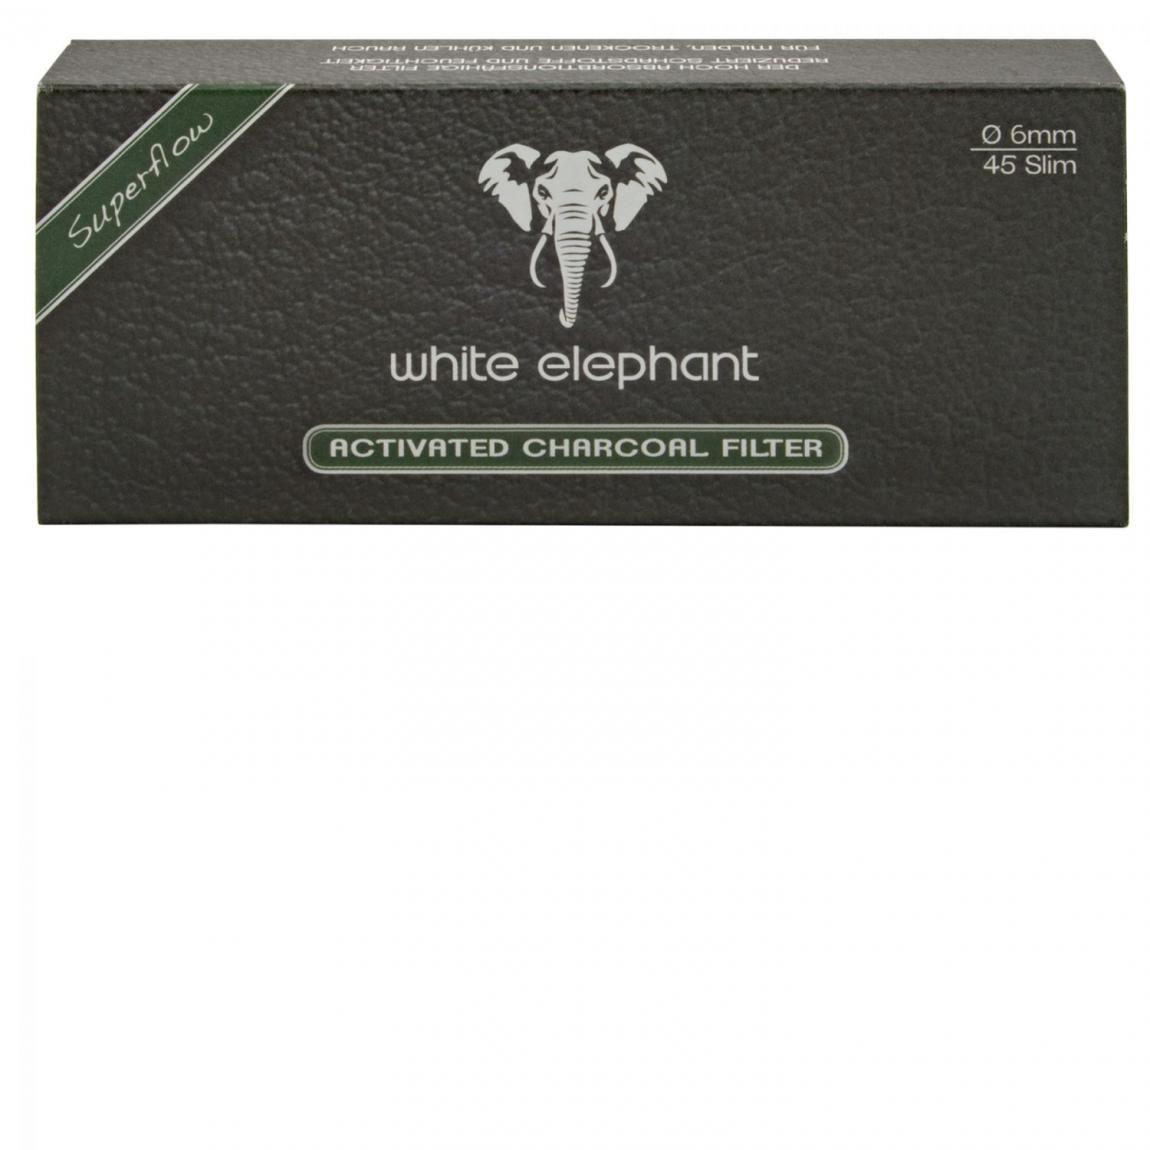 white elephant Aktivkohle-Filter 6mm, 5x45 Stück